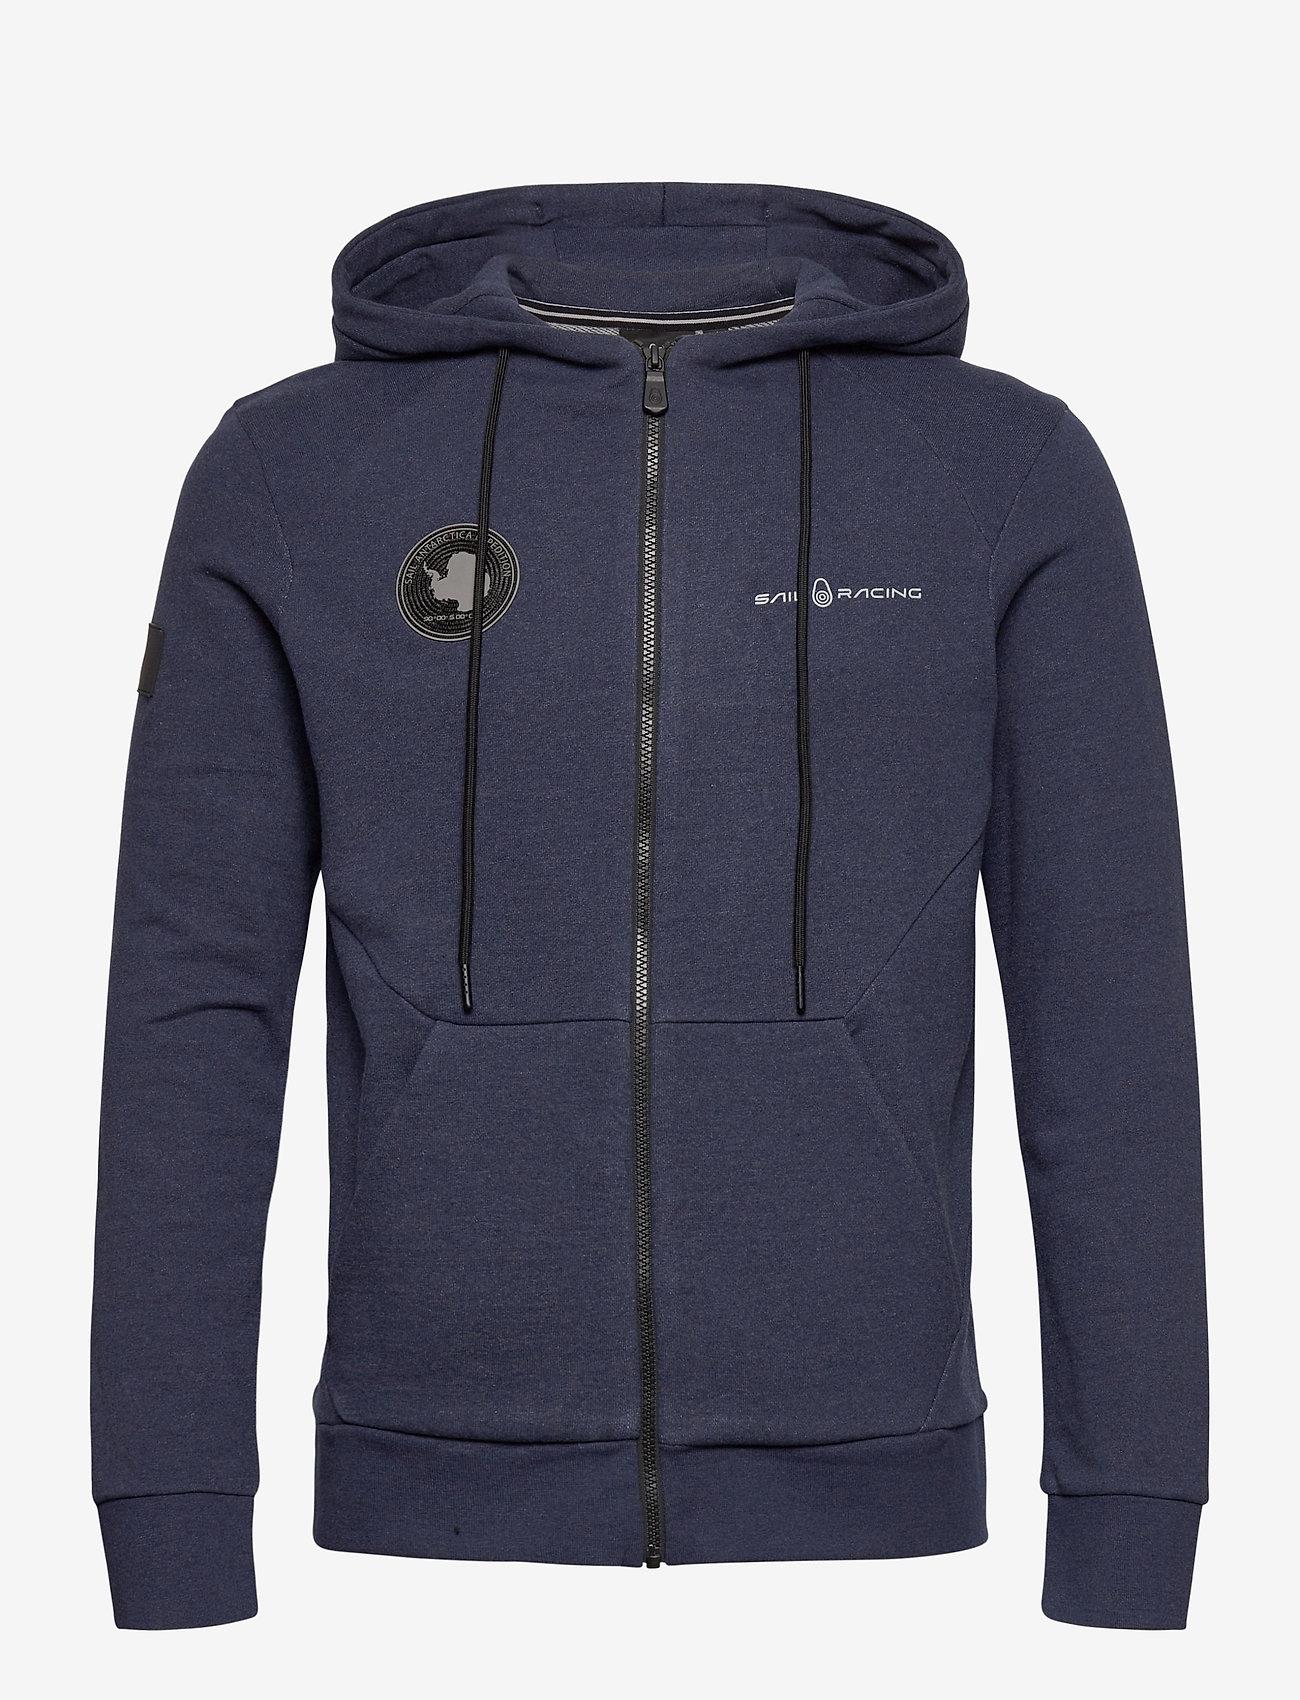 Sail Racing - ANTARCTICA ZIP HOOD - basic sweatshirts - navy melange - 0